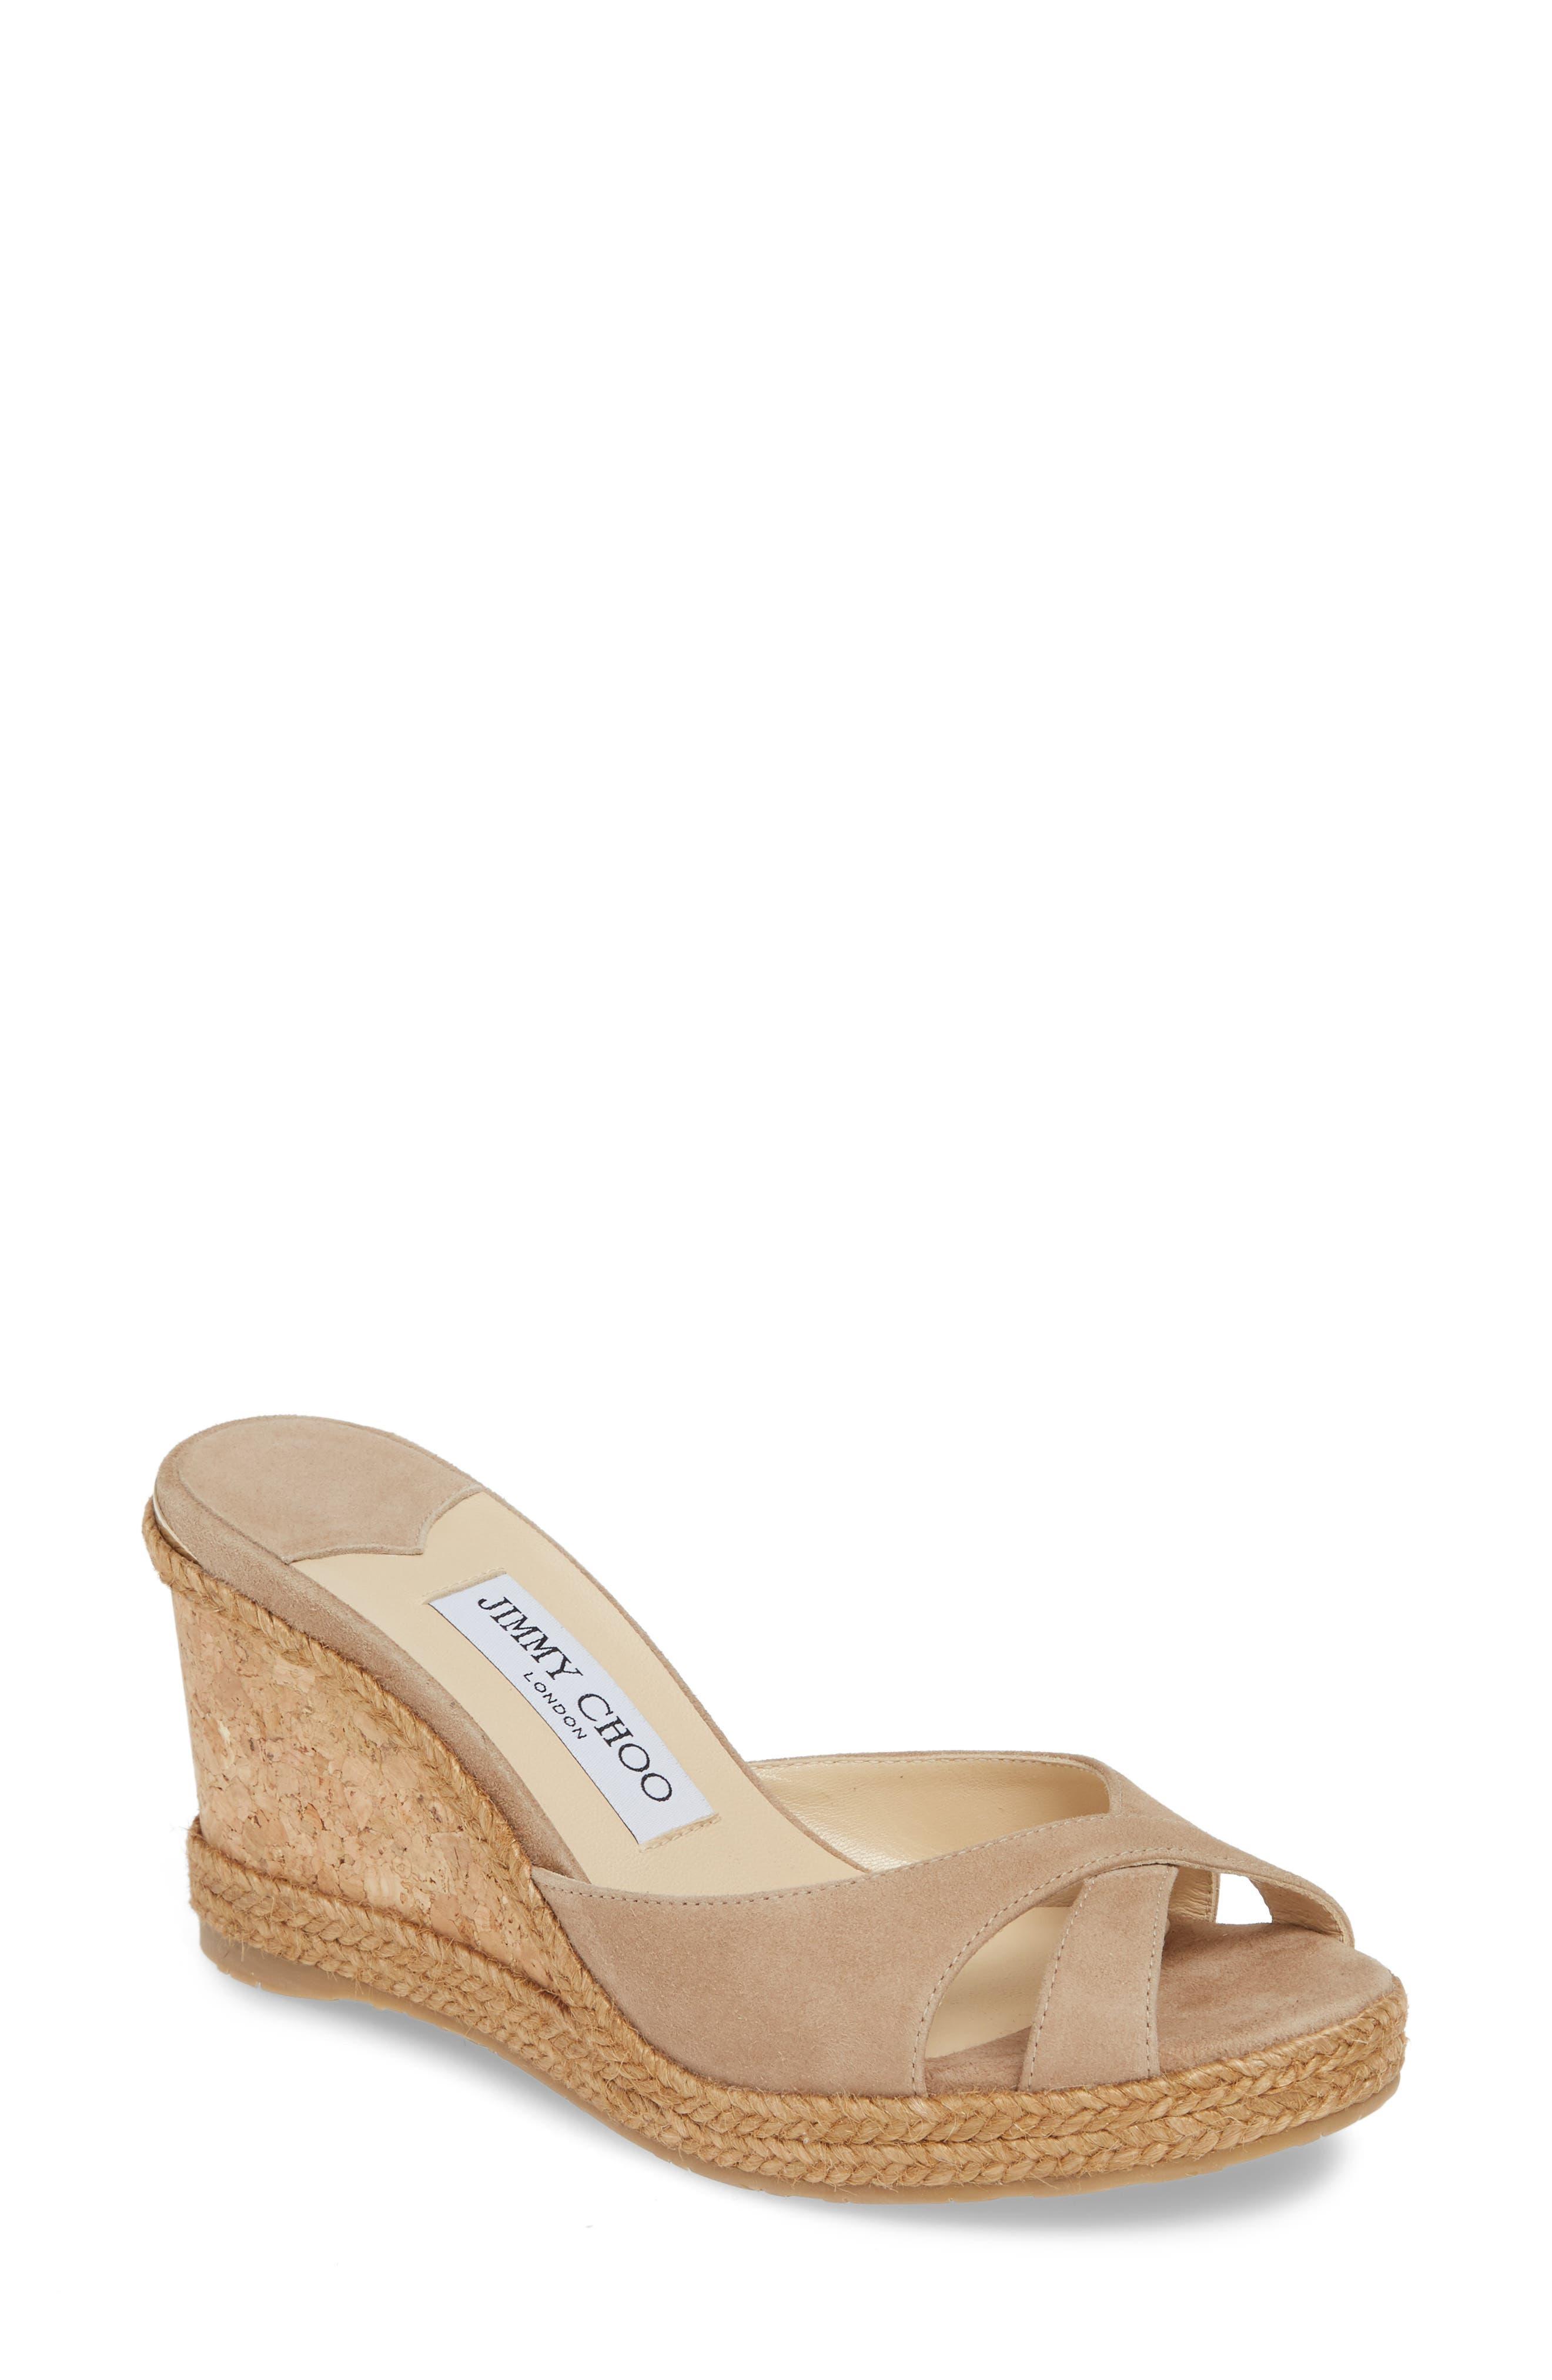 Almer Cork Wedge Sandal, Main, color, NUDE SUEDE